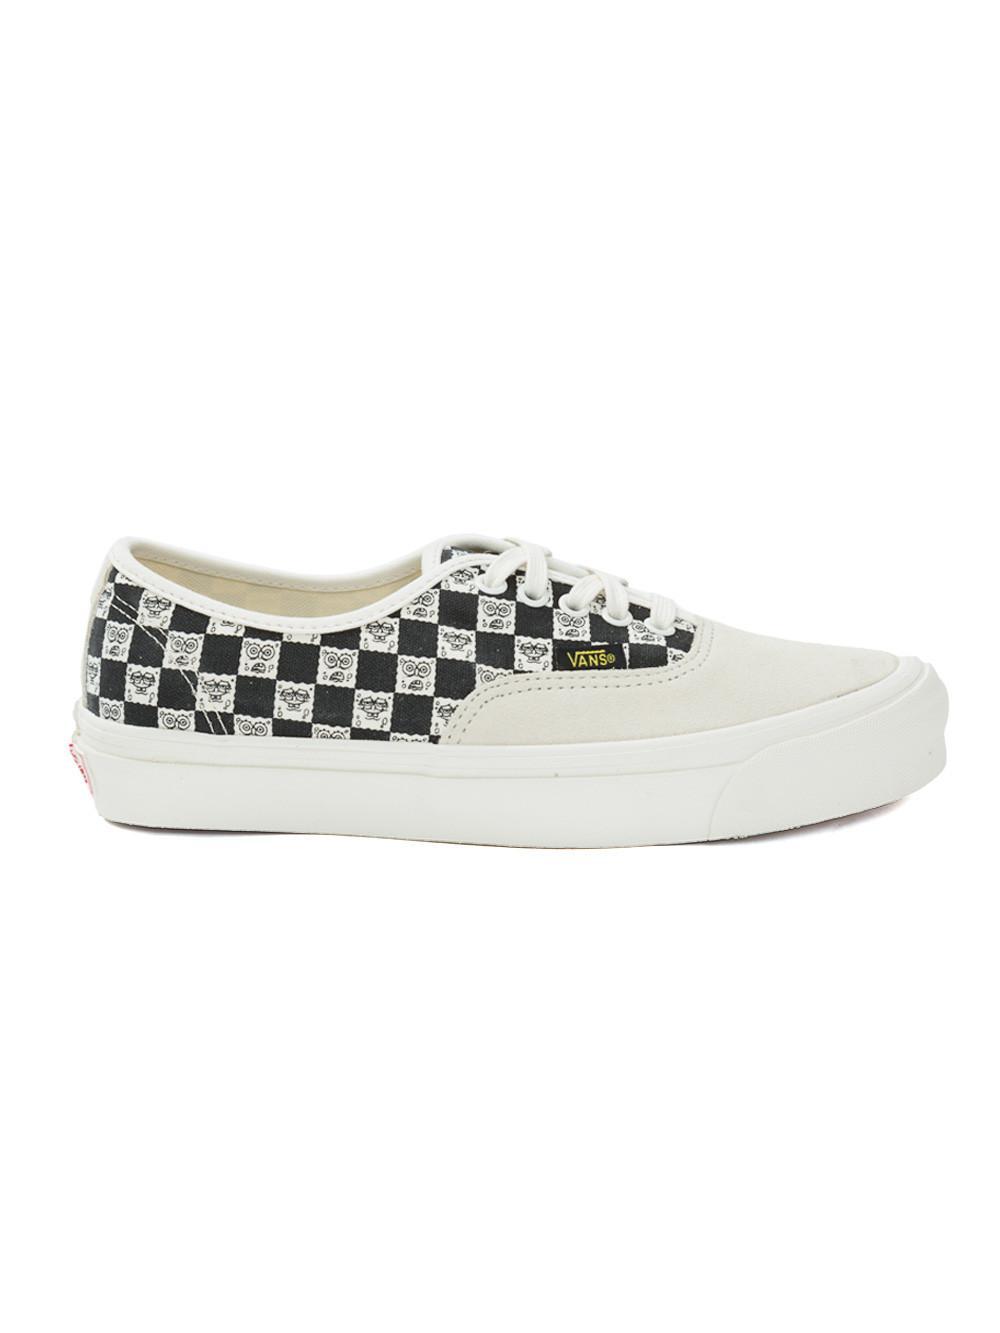 bf52fb6f7e Vans X Spongebob Ua Og Authentic Lx Checked Sneakers In Black